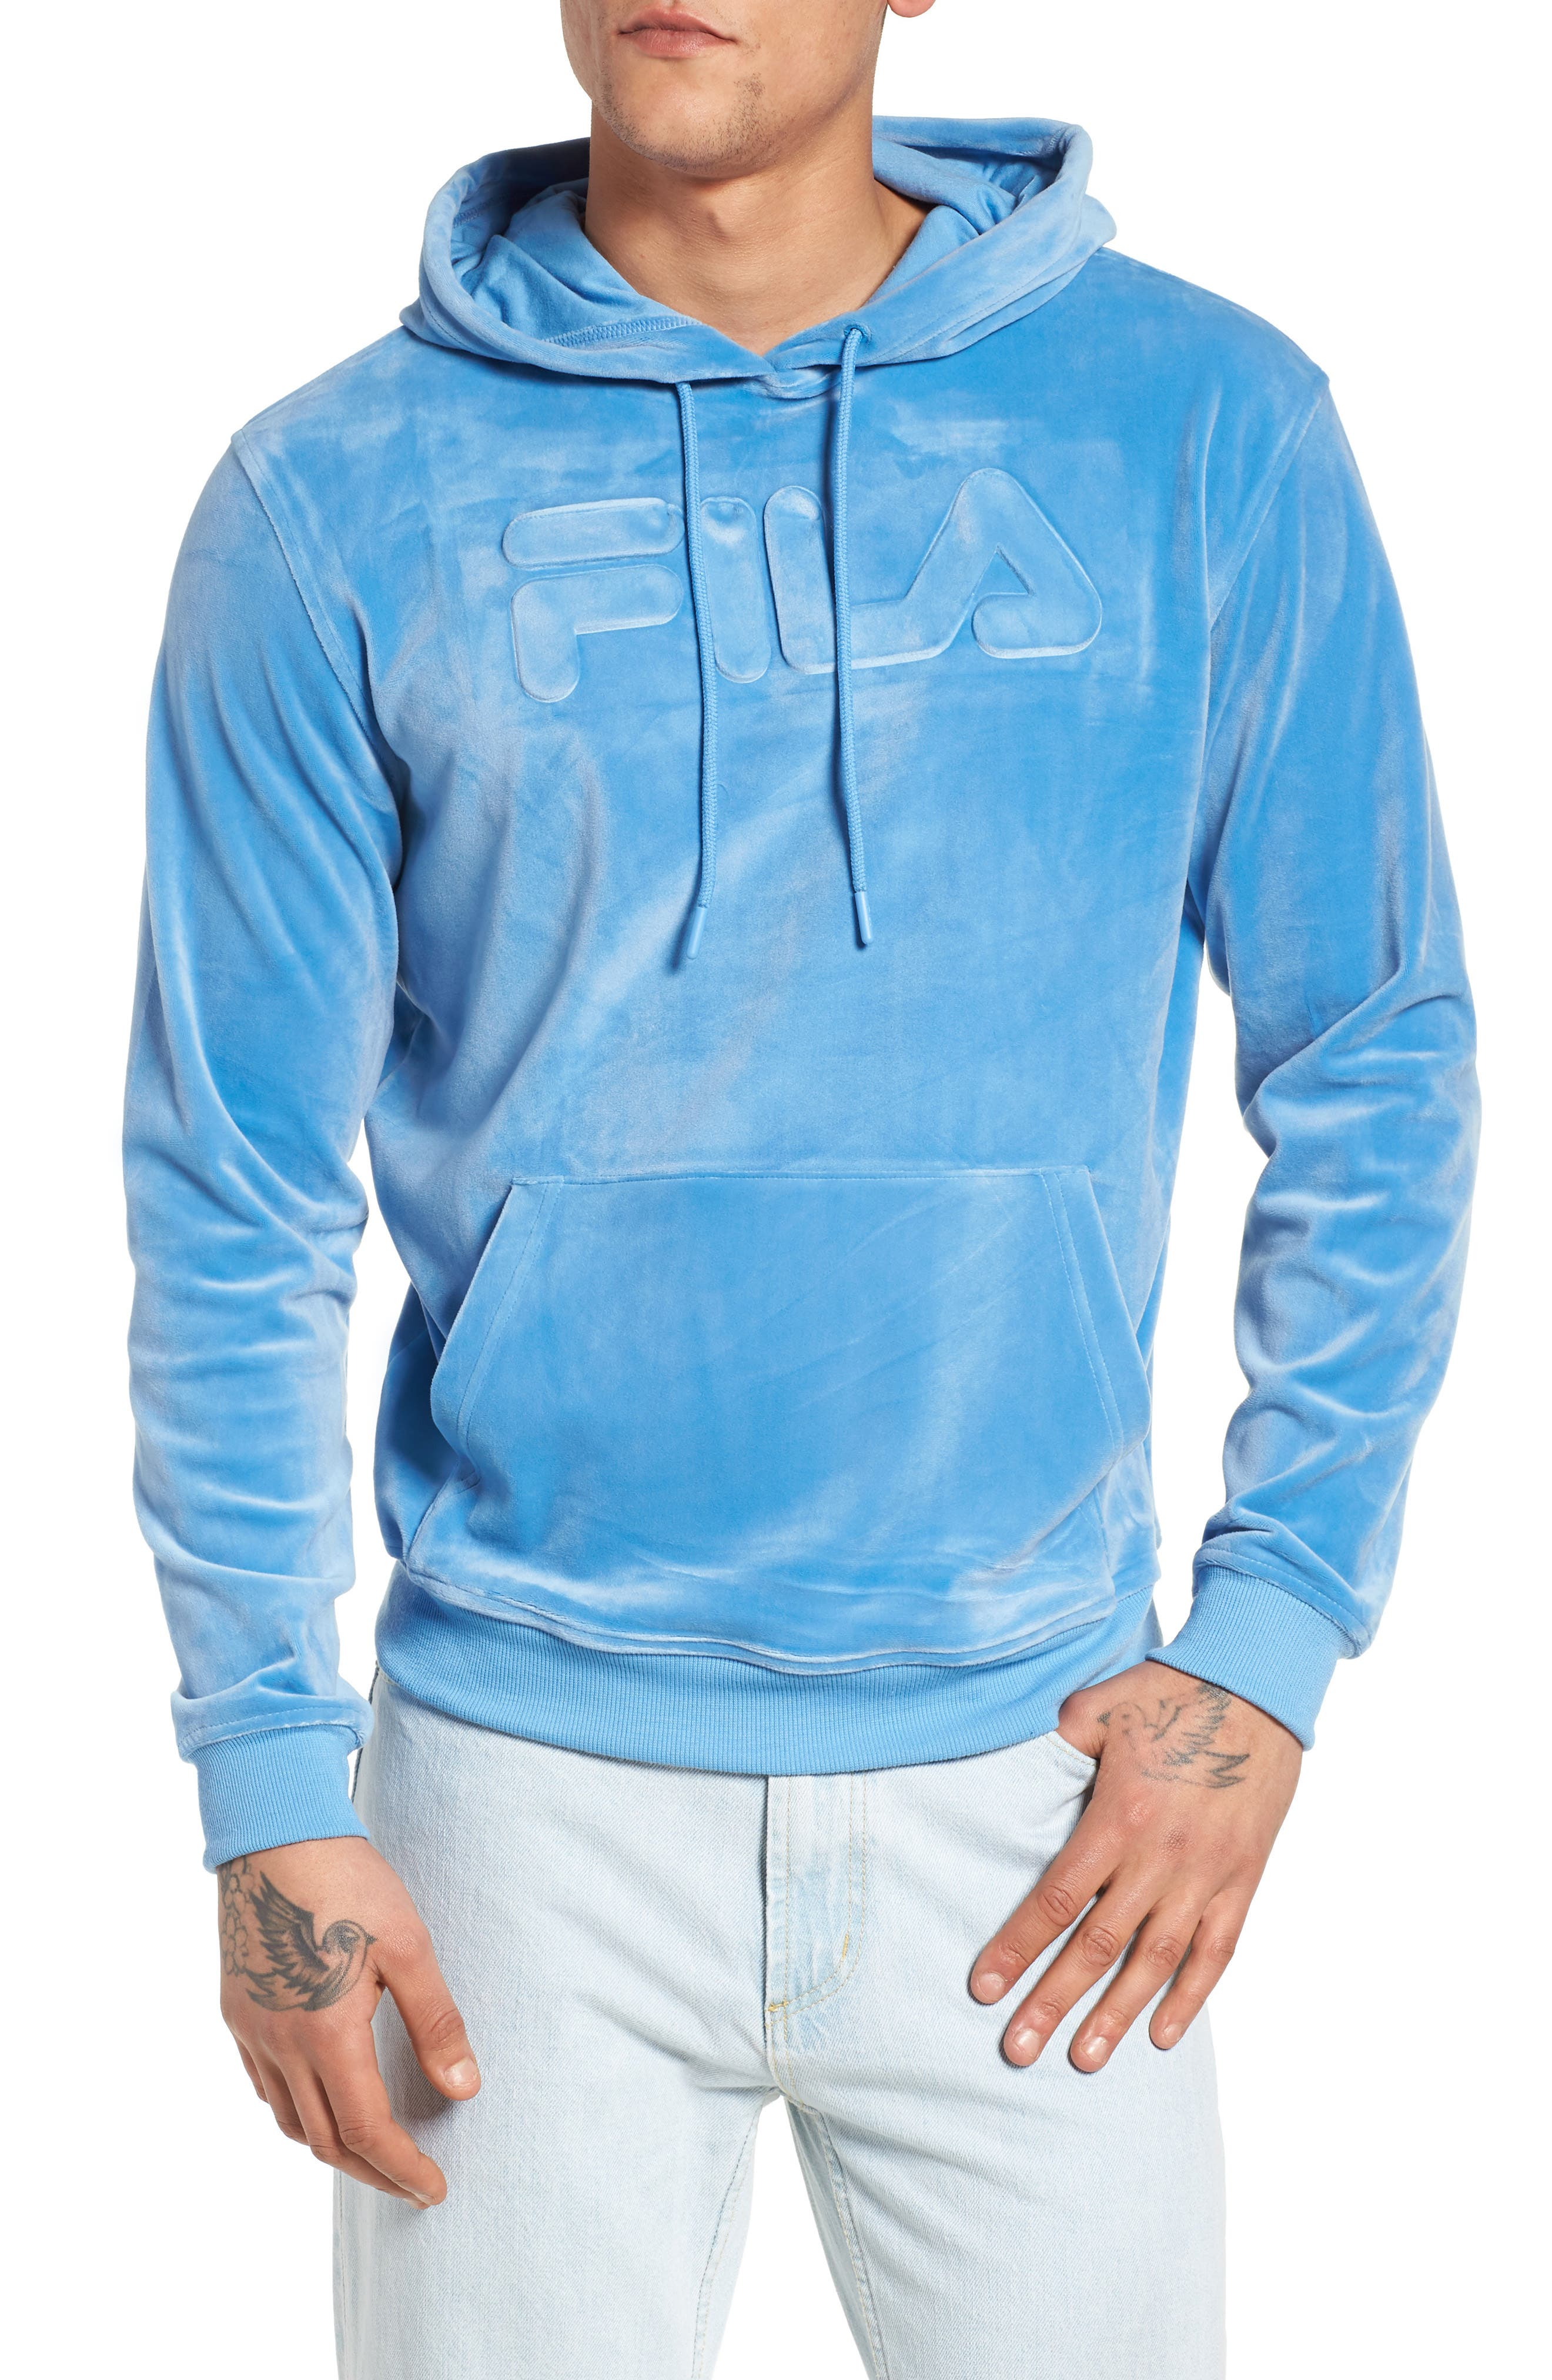 Asher Velour Hoodie Sweatshirt,                             Main thumbnail 1, color,                             Silver Lake Blue